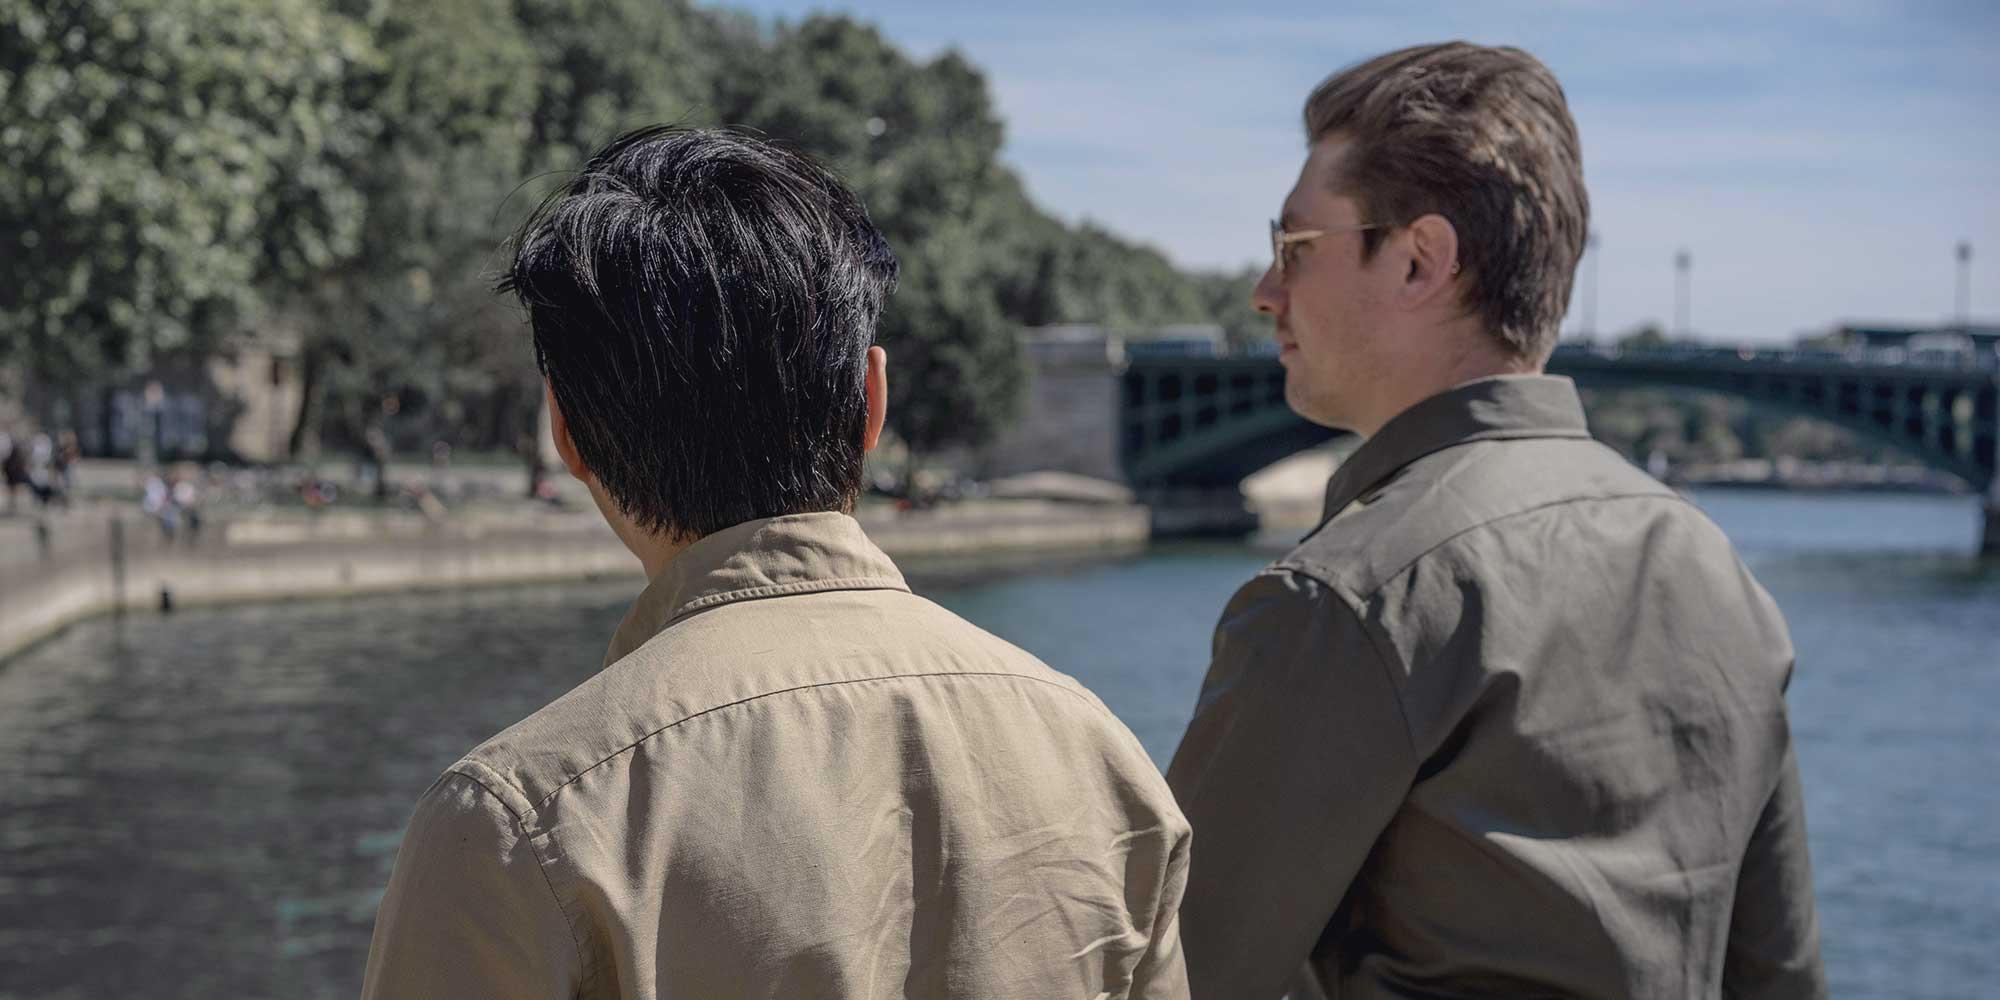 La chemise safari par Swann et Oscar